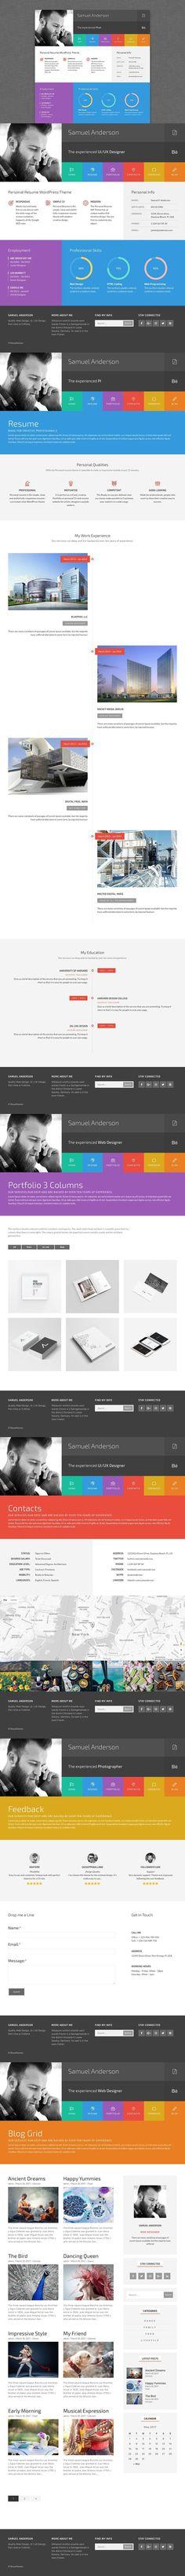 Mineem - Minimal Portfolio\/Blog Minimal and Wordpress - wordpress resume themes